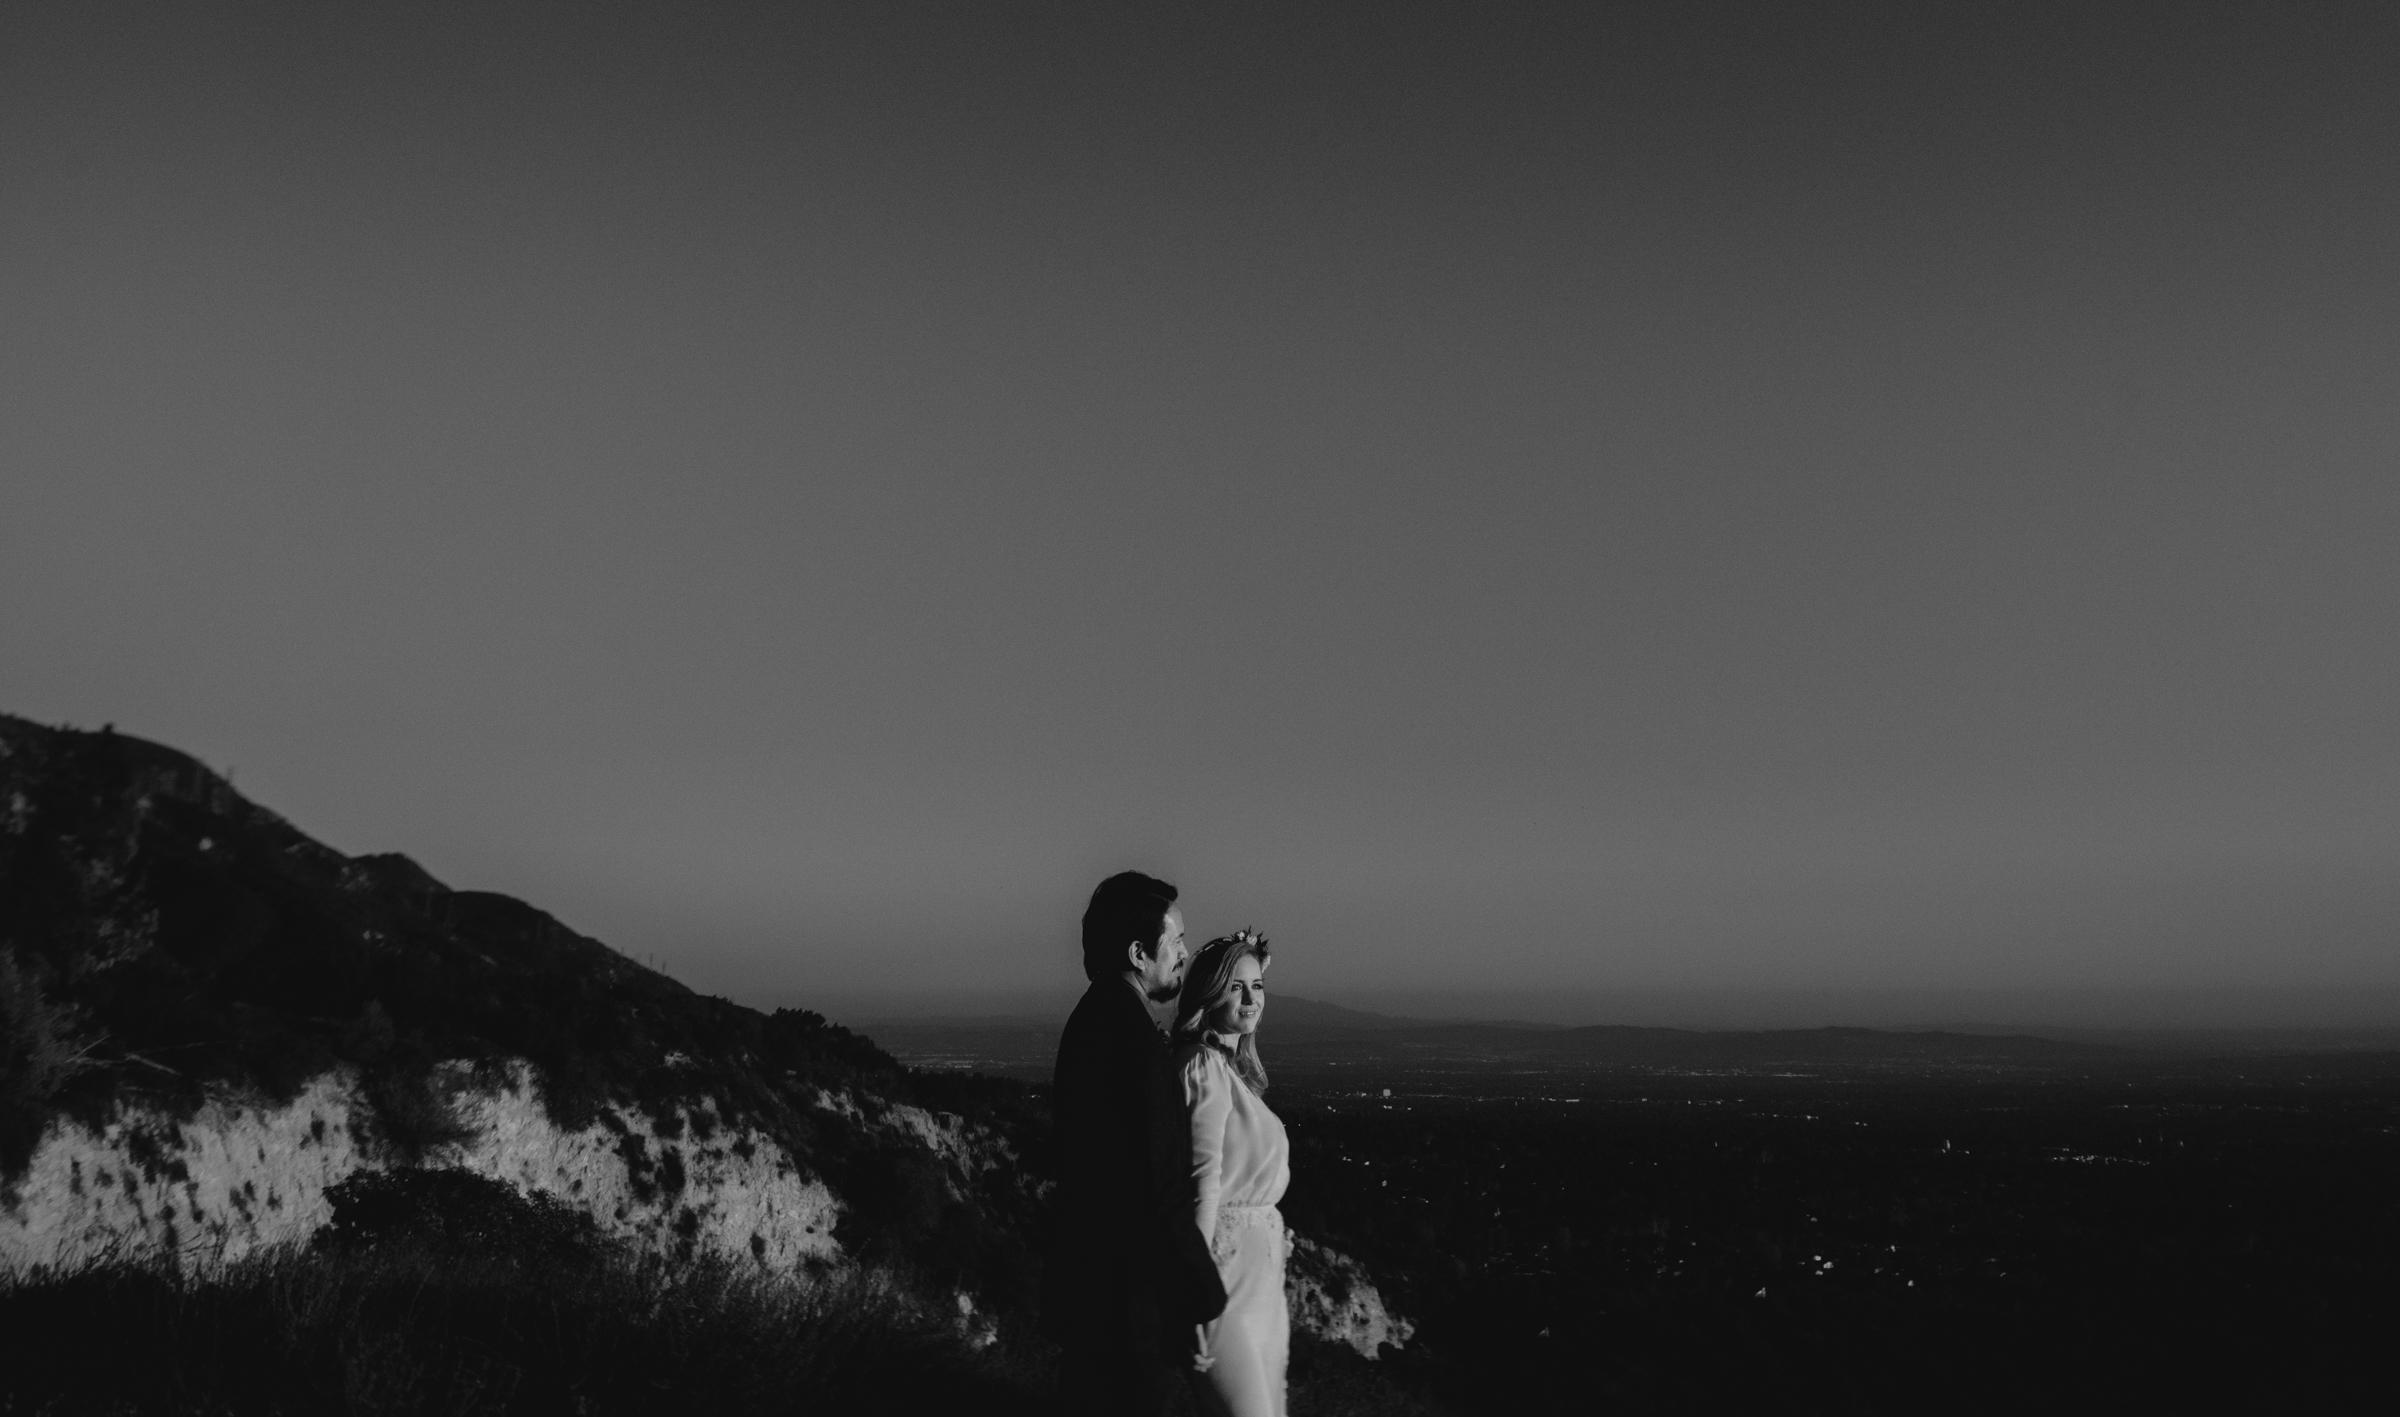 ©Isaiah + Taylor Photography - Intimate Elopement, Eaton Canyon, Los Angeles Wedding Photographer-74.jpg